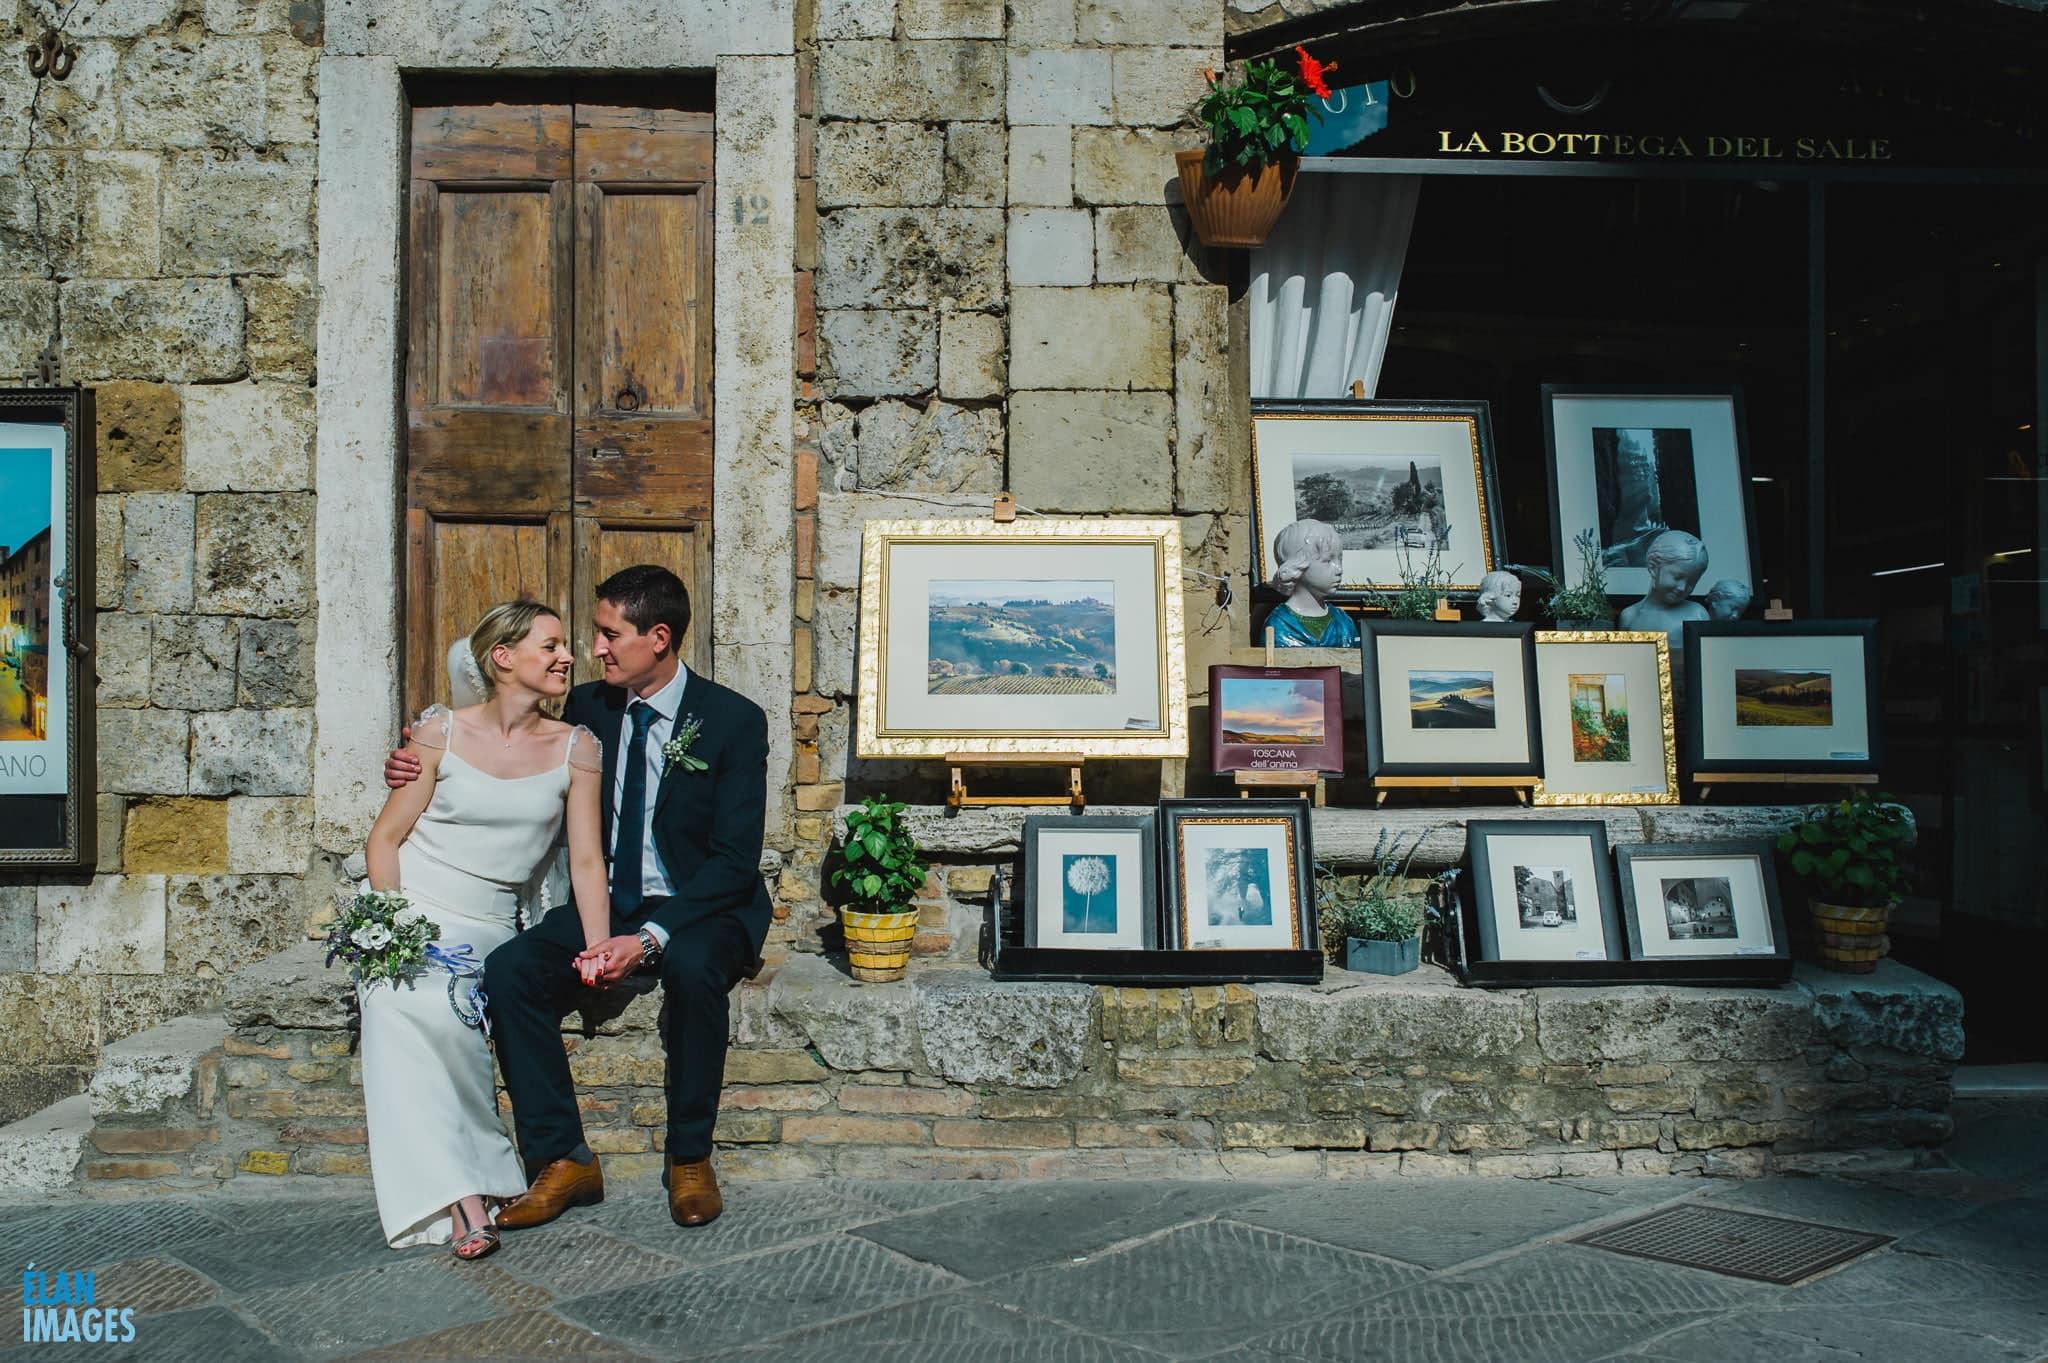 San Gimignano Wedding in Italy 63